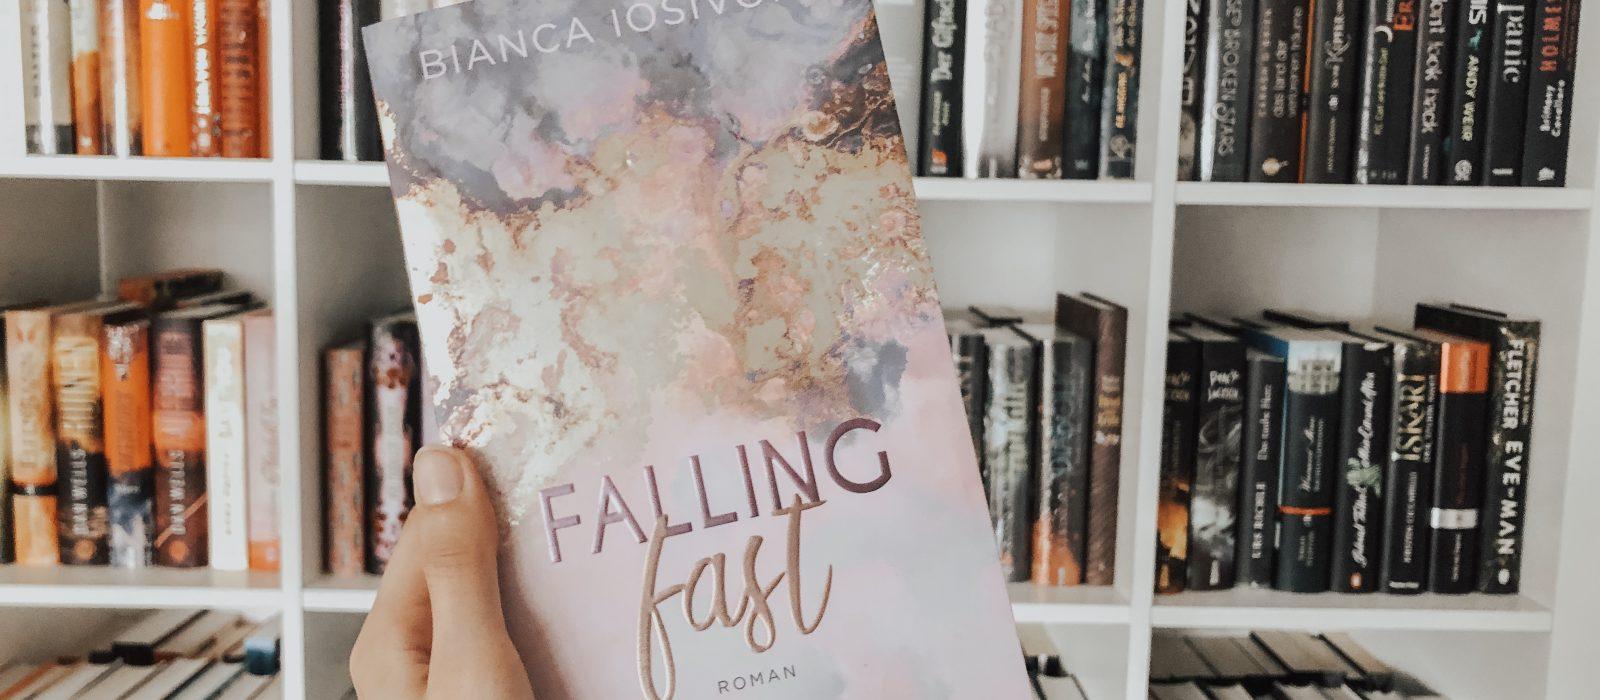 Rezension | Falling Fast und Flying High – Bianca Iosivoni